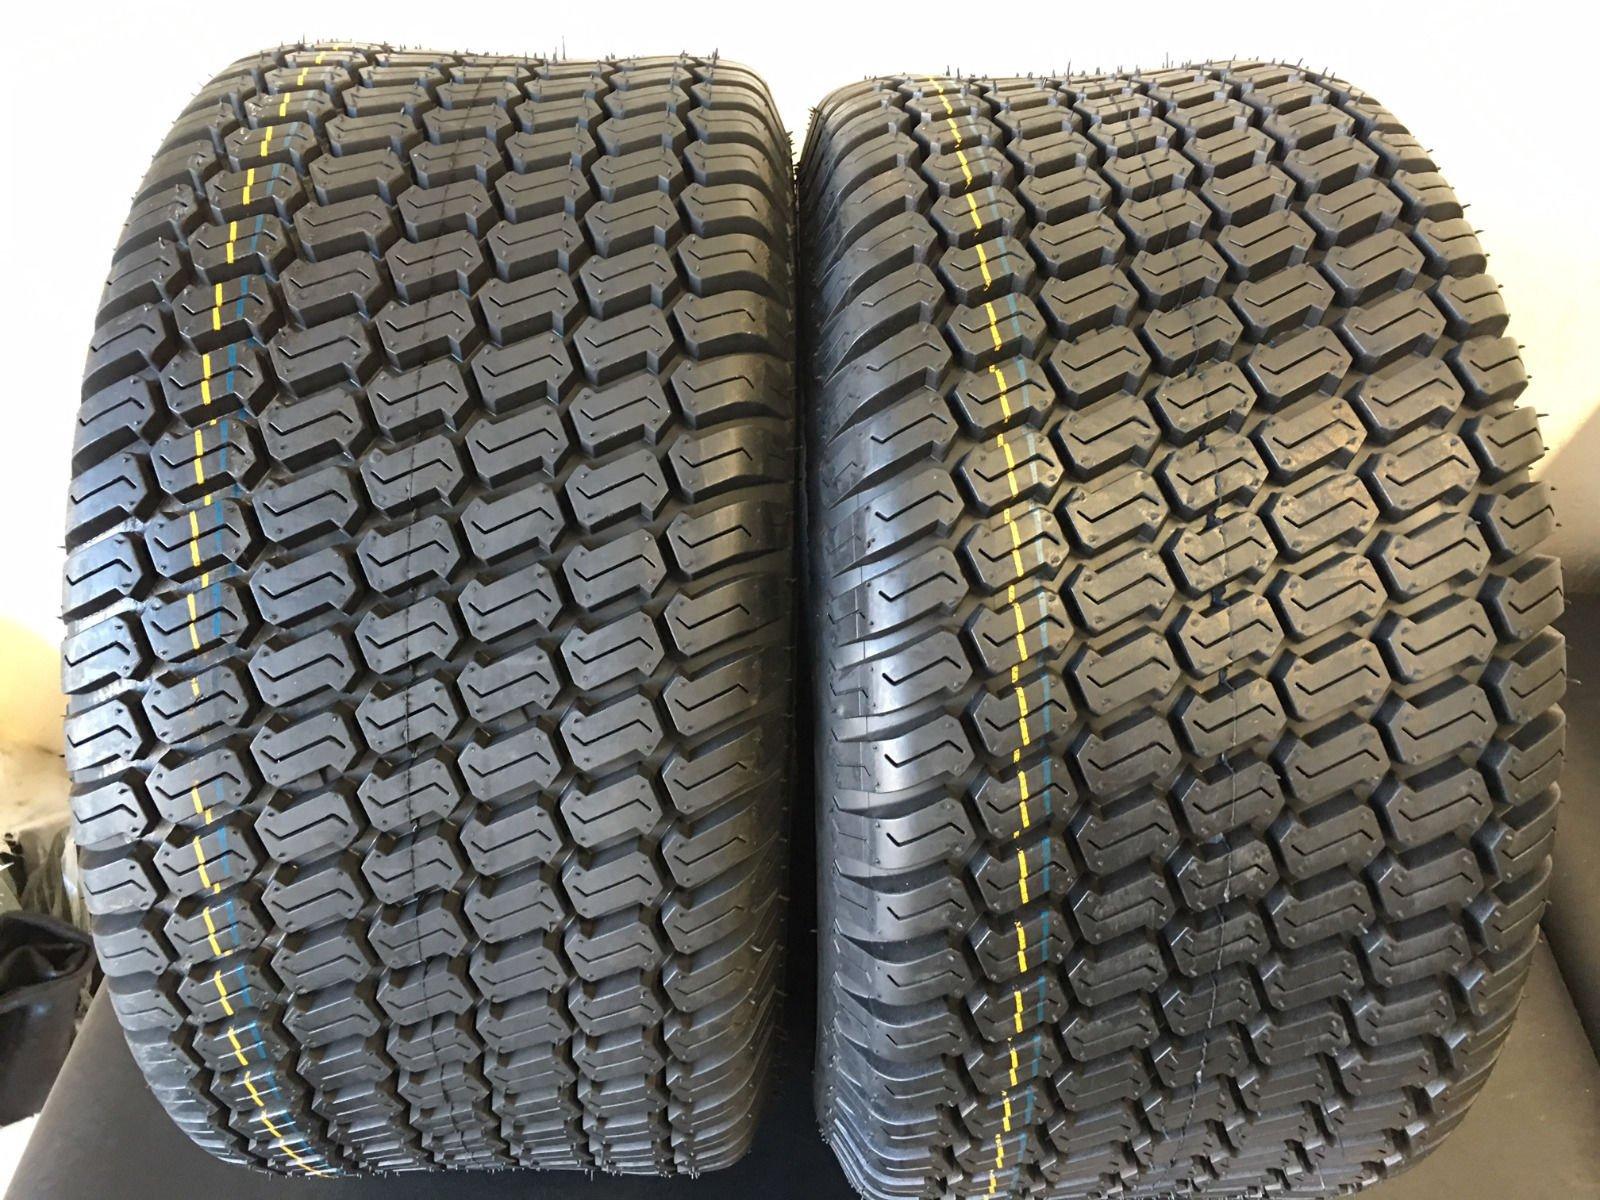 TWO 23/10.50-12 Lawnmower/Golf Cart Turf Tread tires